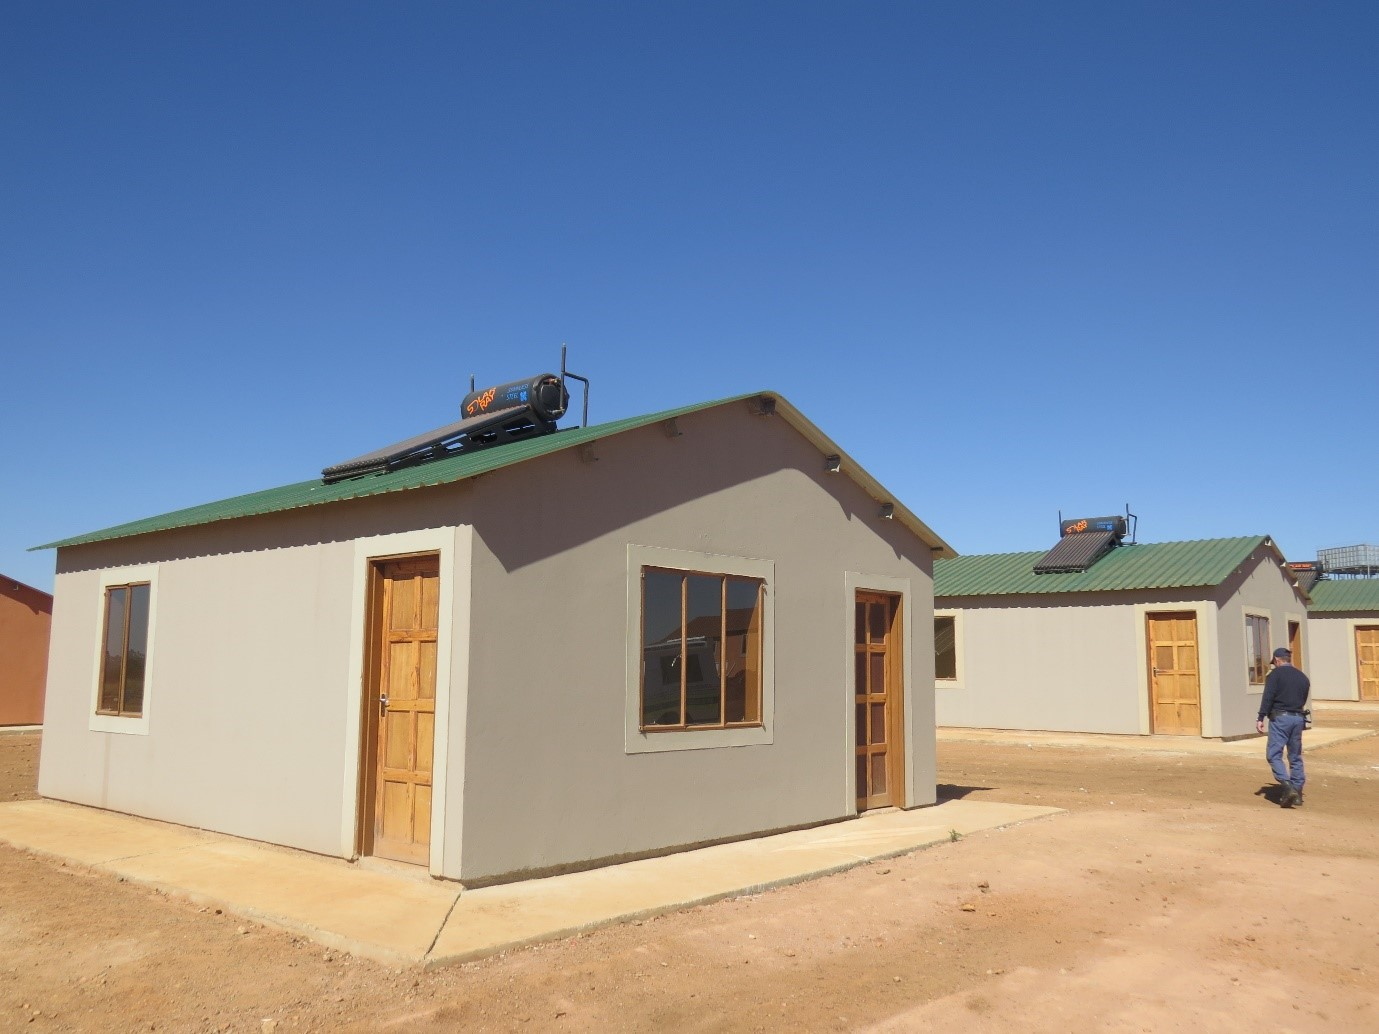 Photo by Gauteng.gov.za – Gauteng Digital Platform